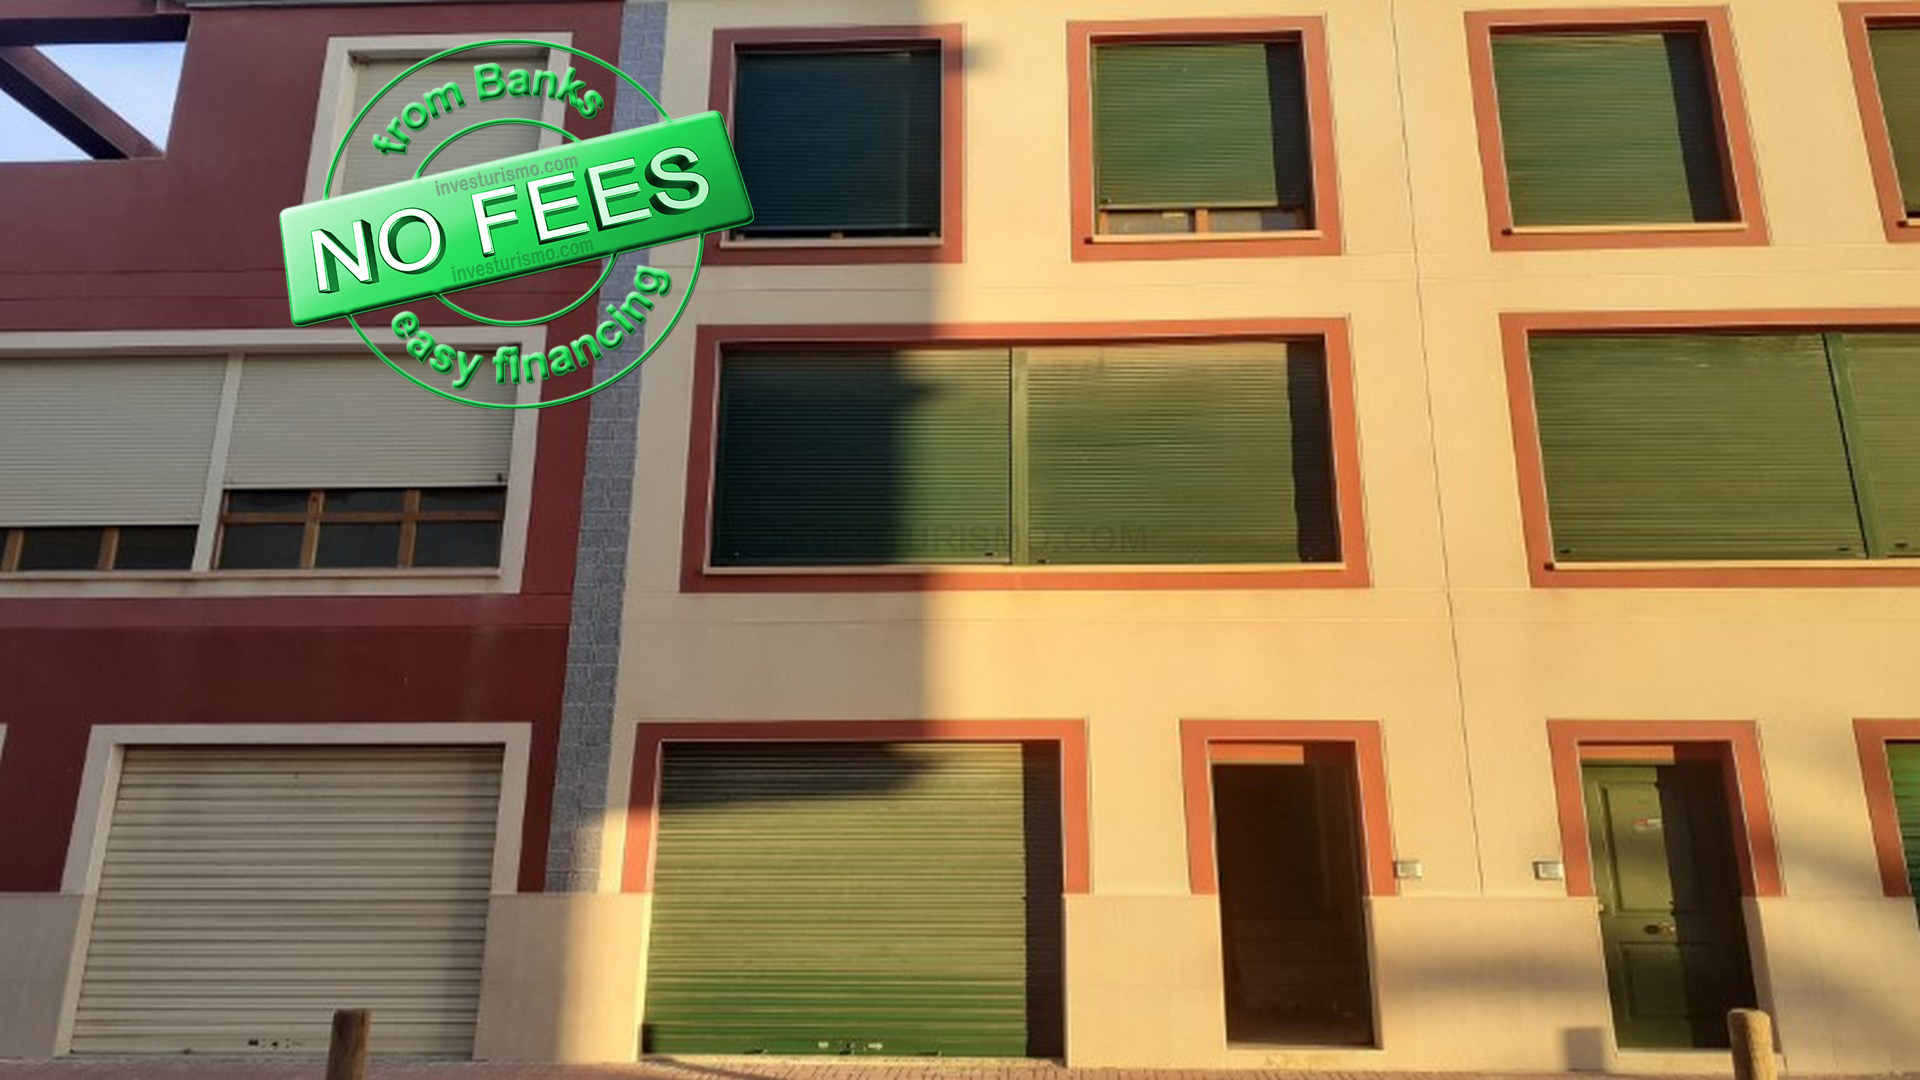 Semi-detached duplex villa 5 bedrooms 3 bathrooms in San Isidro